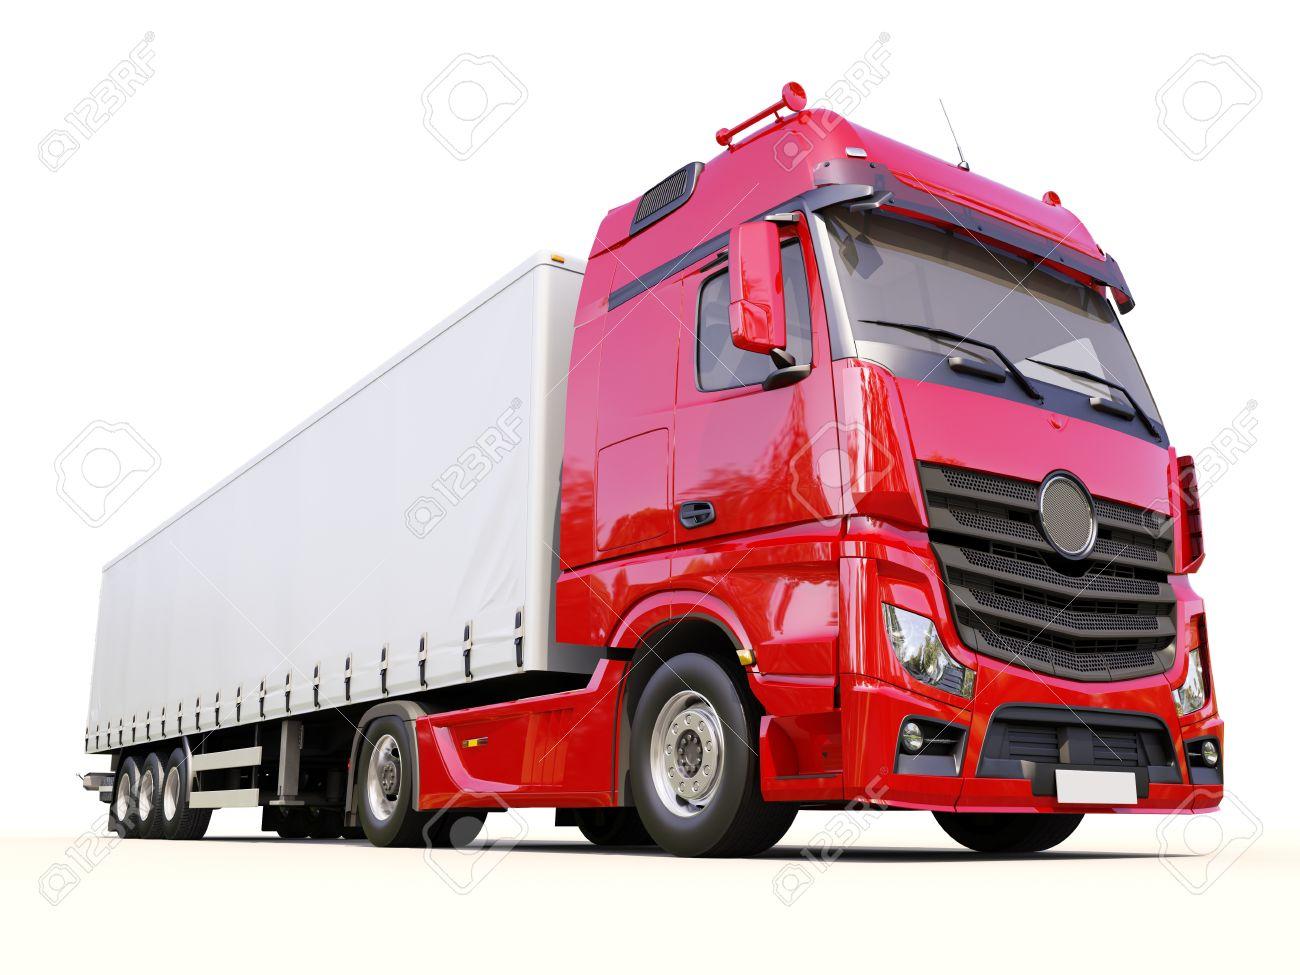 A modern semi-trailer truck on light background - 21756638